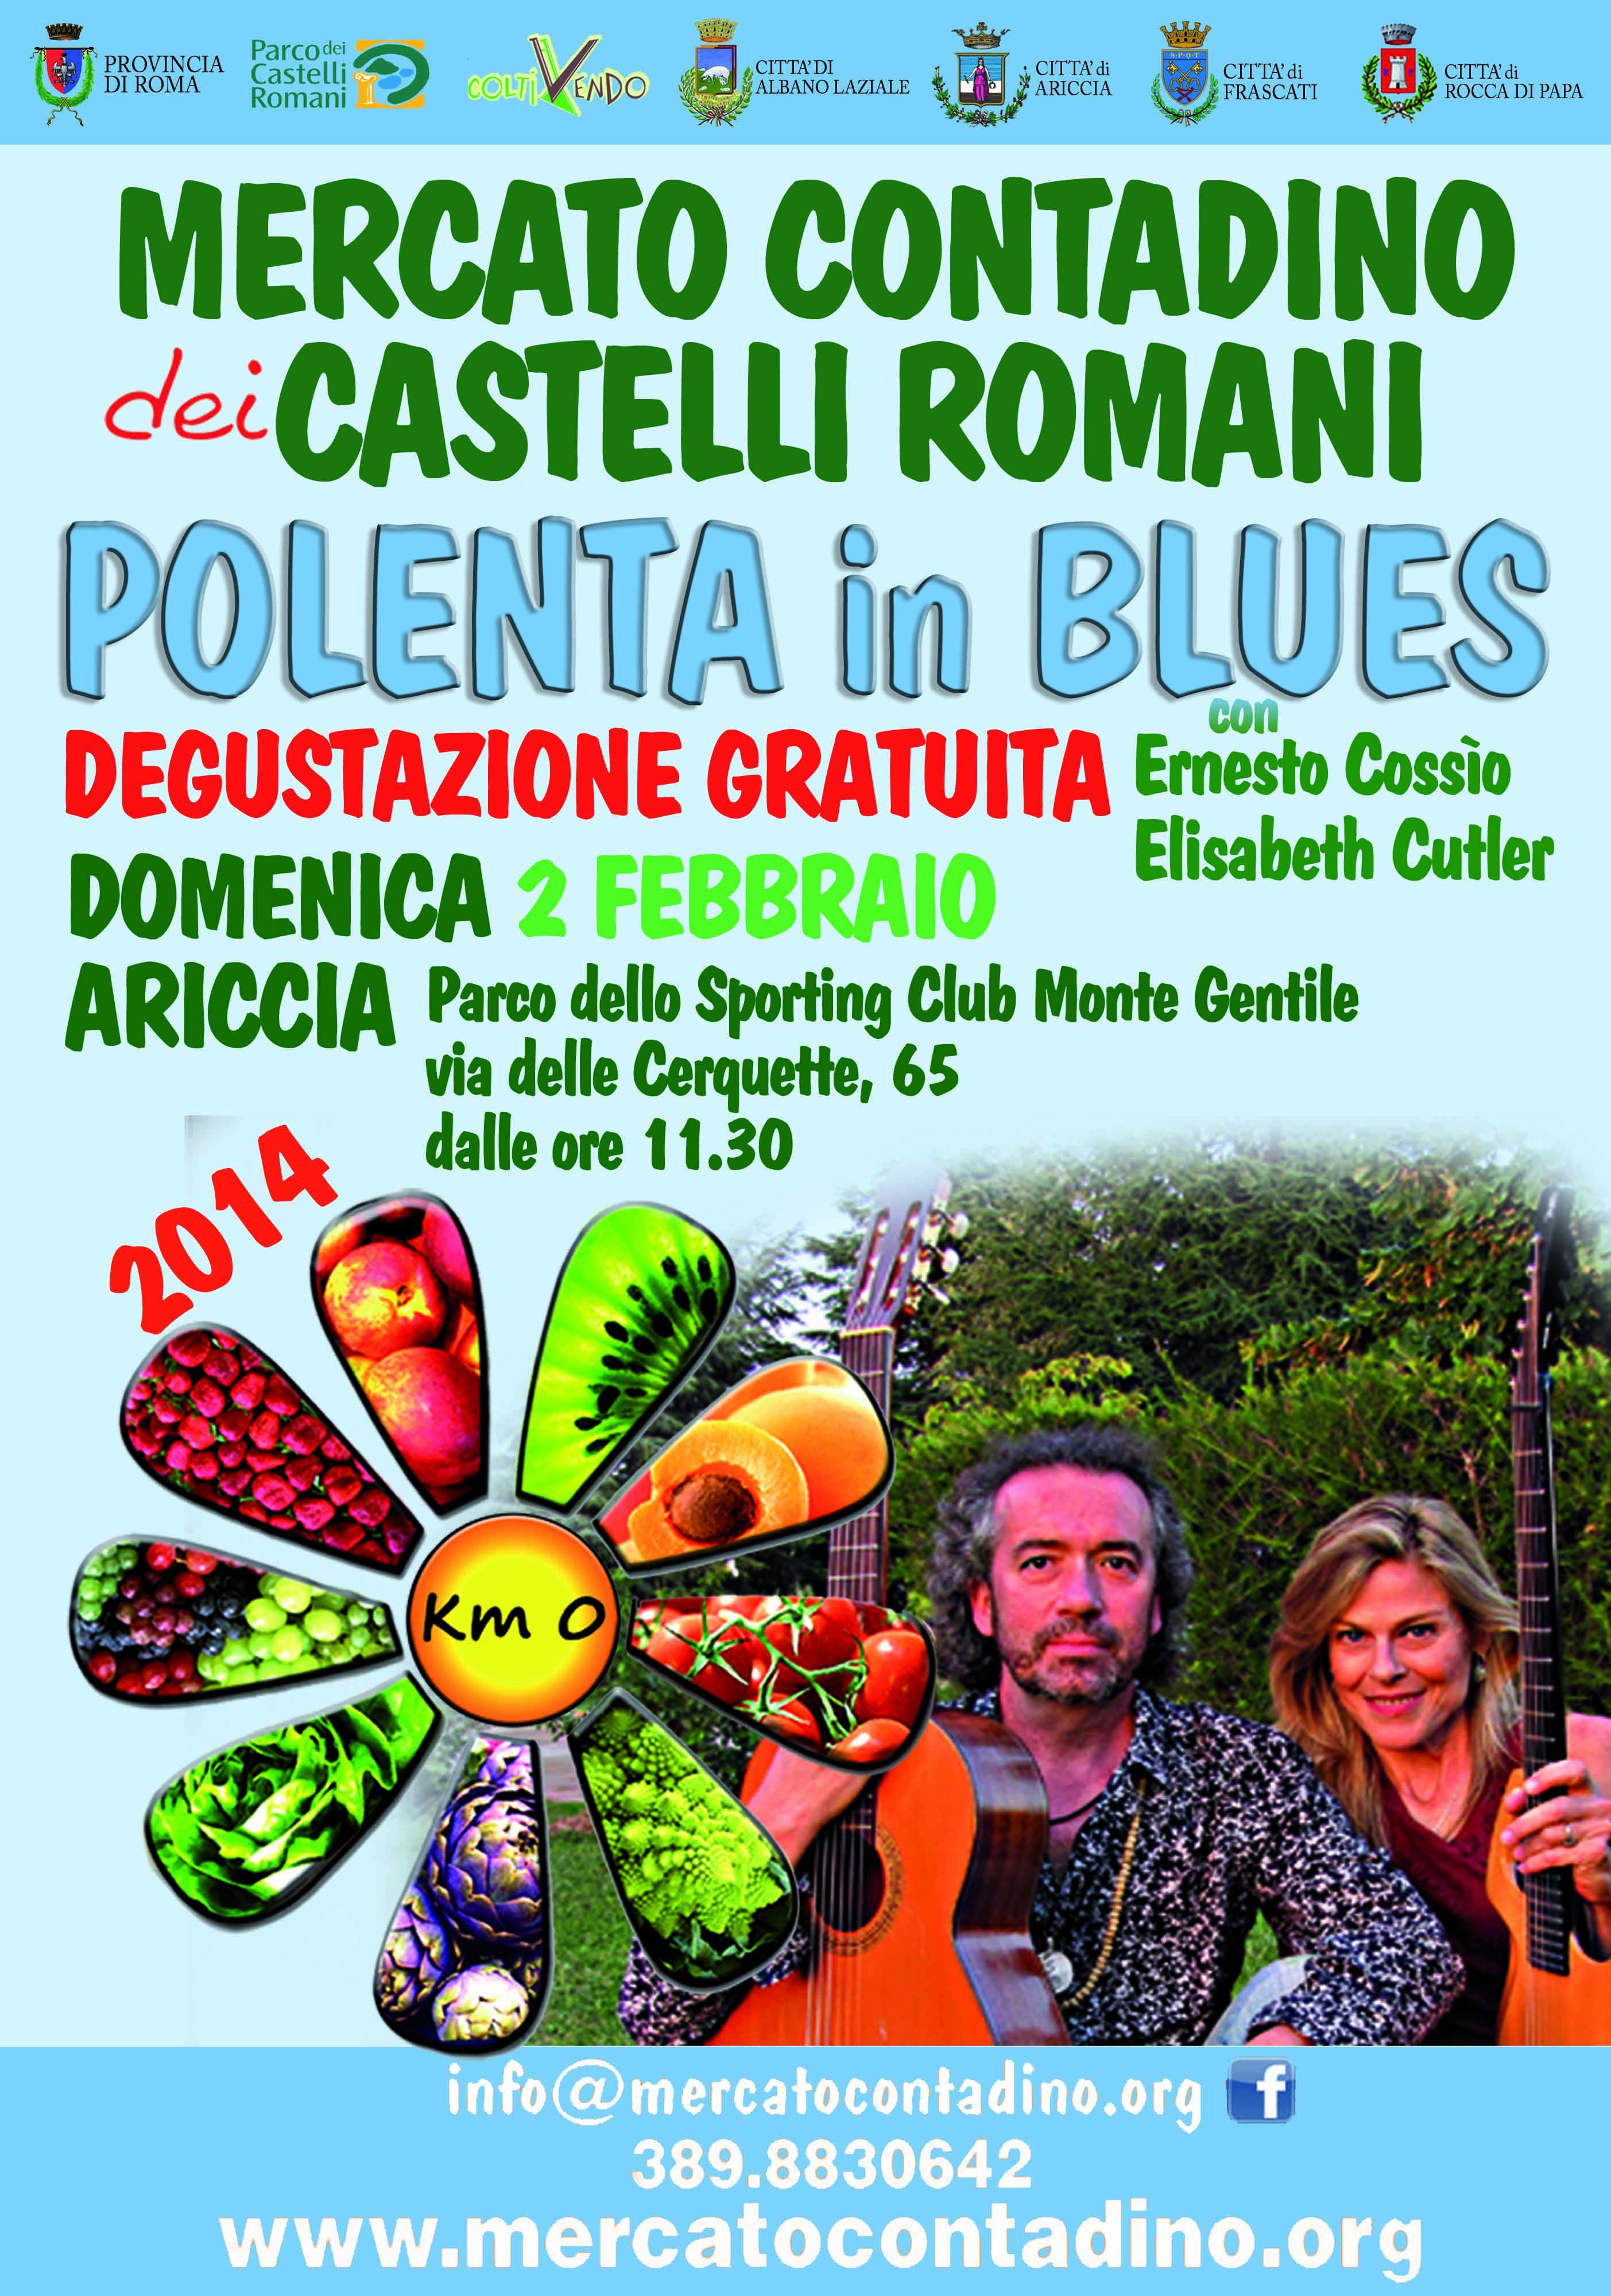 polenta_in_blues_2014_ad_ariccia_domenca_2_febbraio_2014